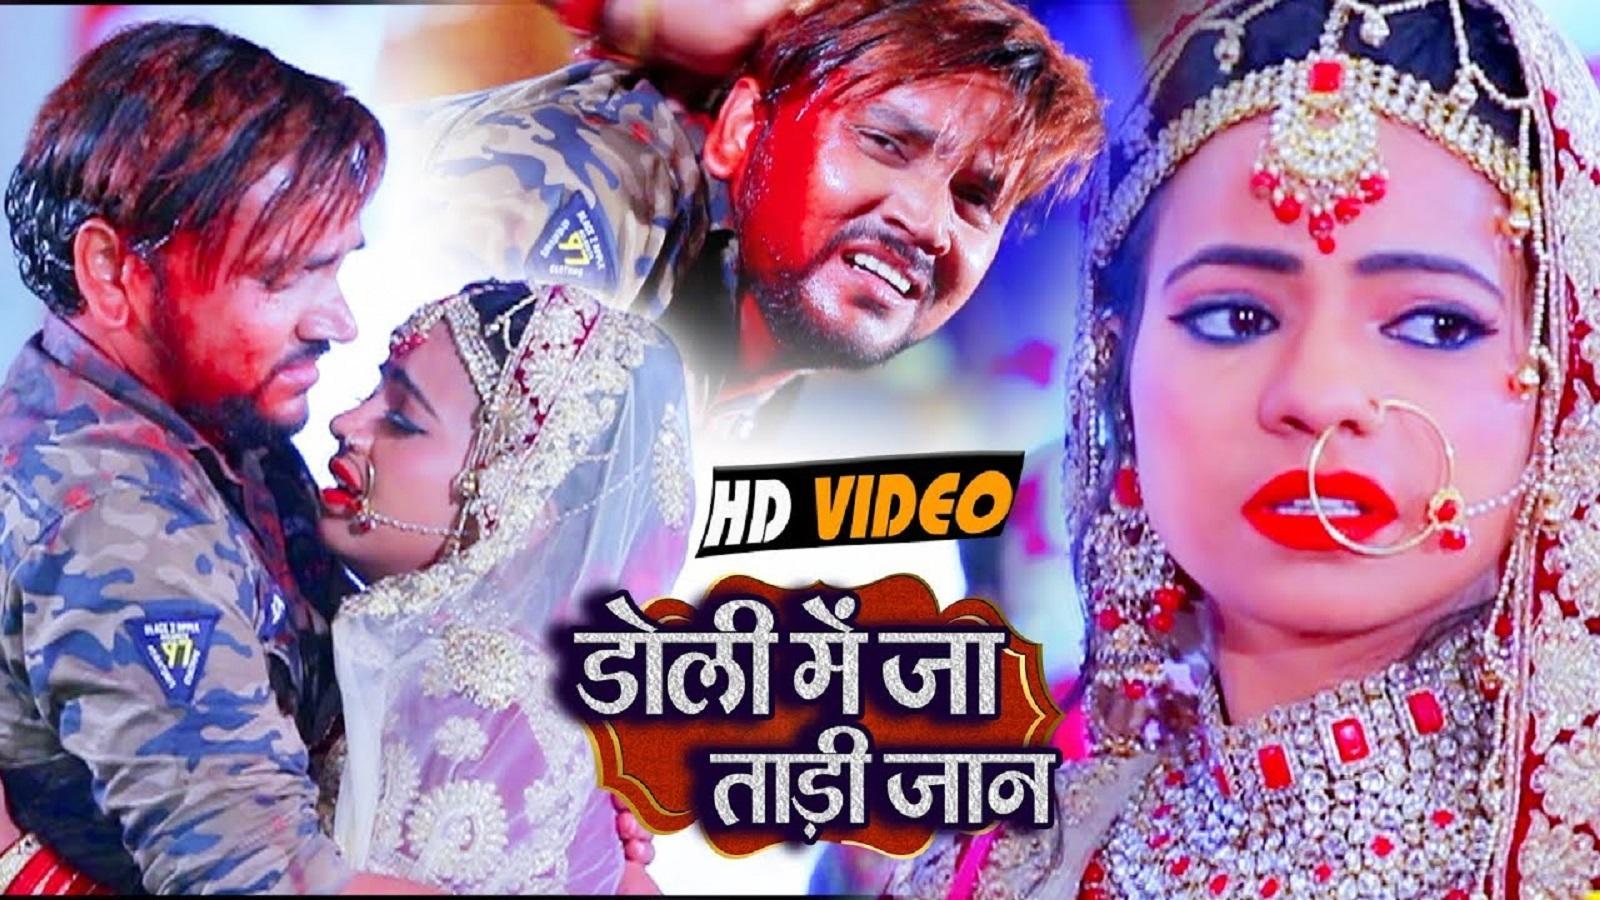 New Bhojpuri Sad Song Video 2020: Gunjan Singh's Latest Bhojpuri Gana HD Video  Song 'Doli Me Ja Tari Jaan'